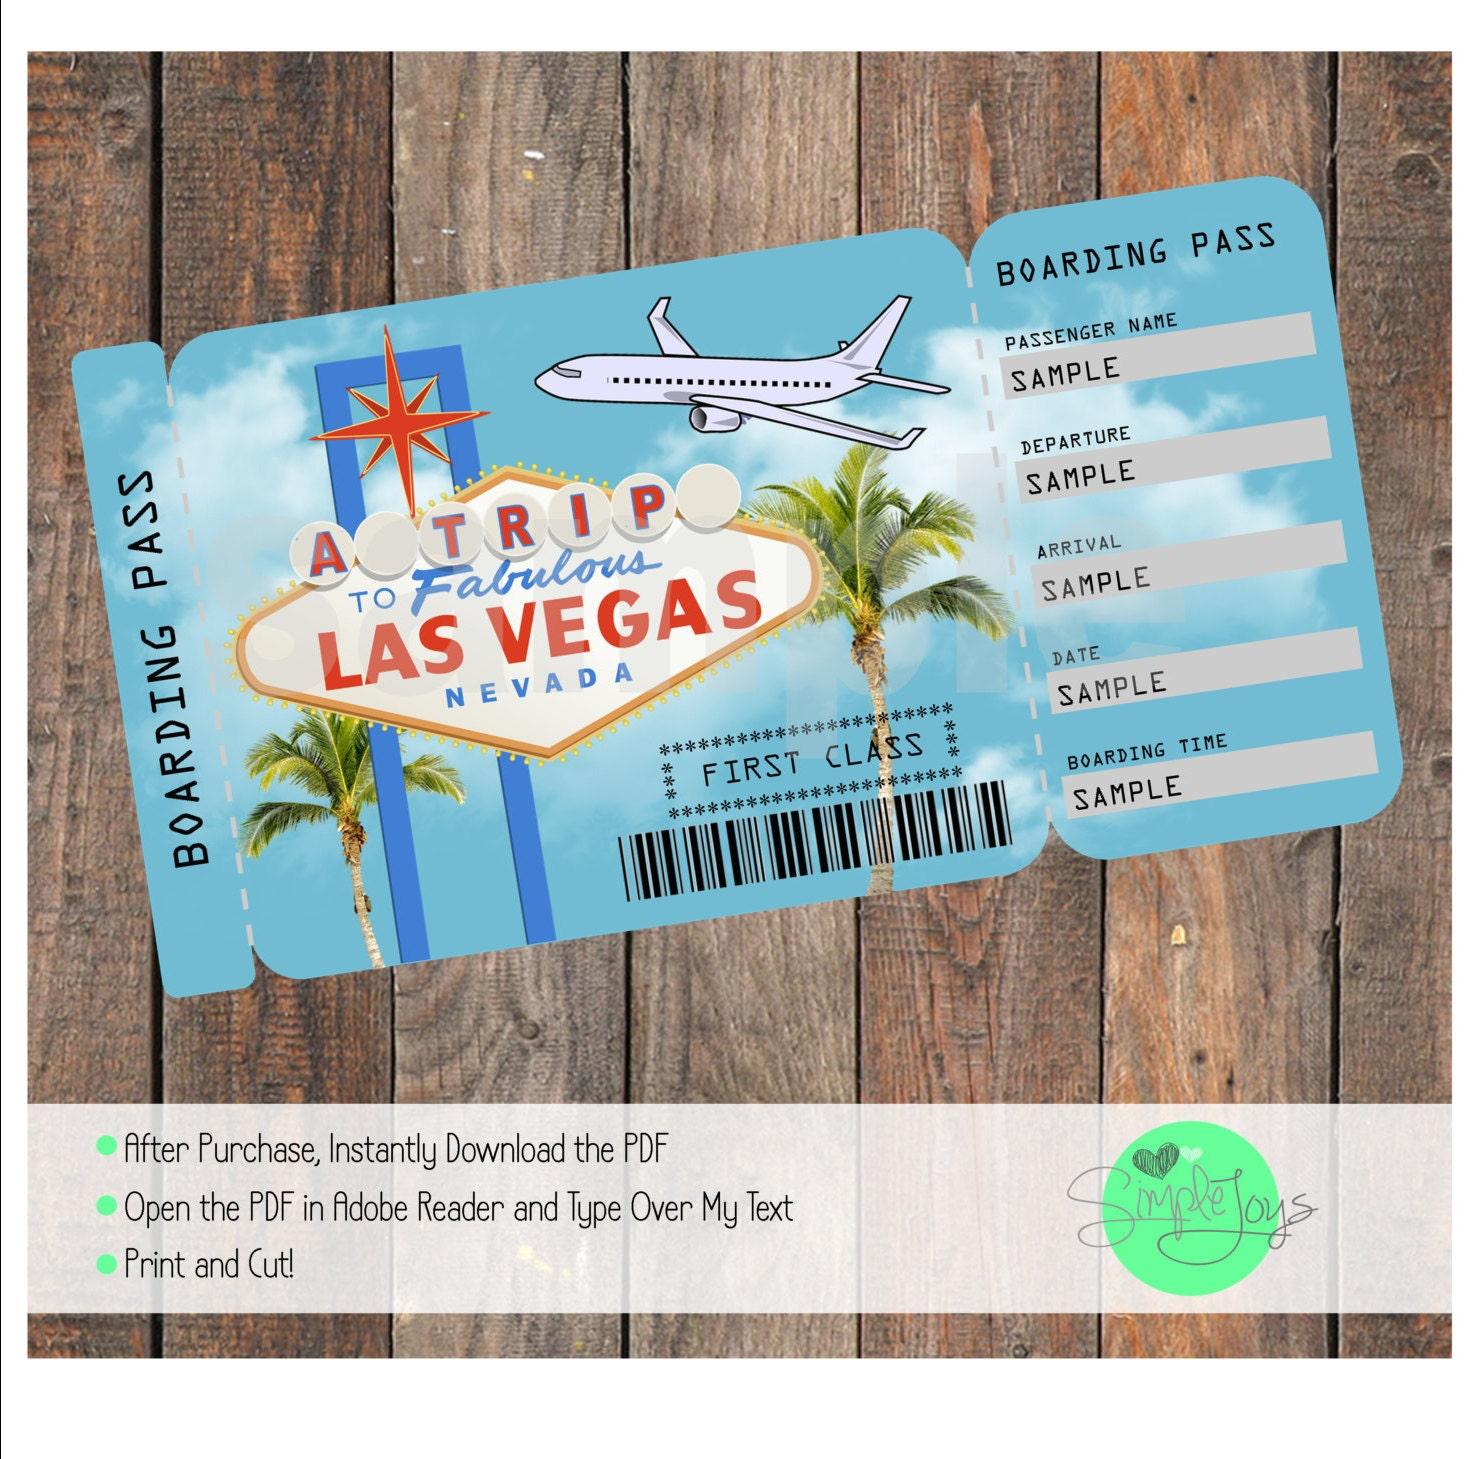 Do I need to print my boarding pass